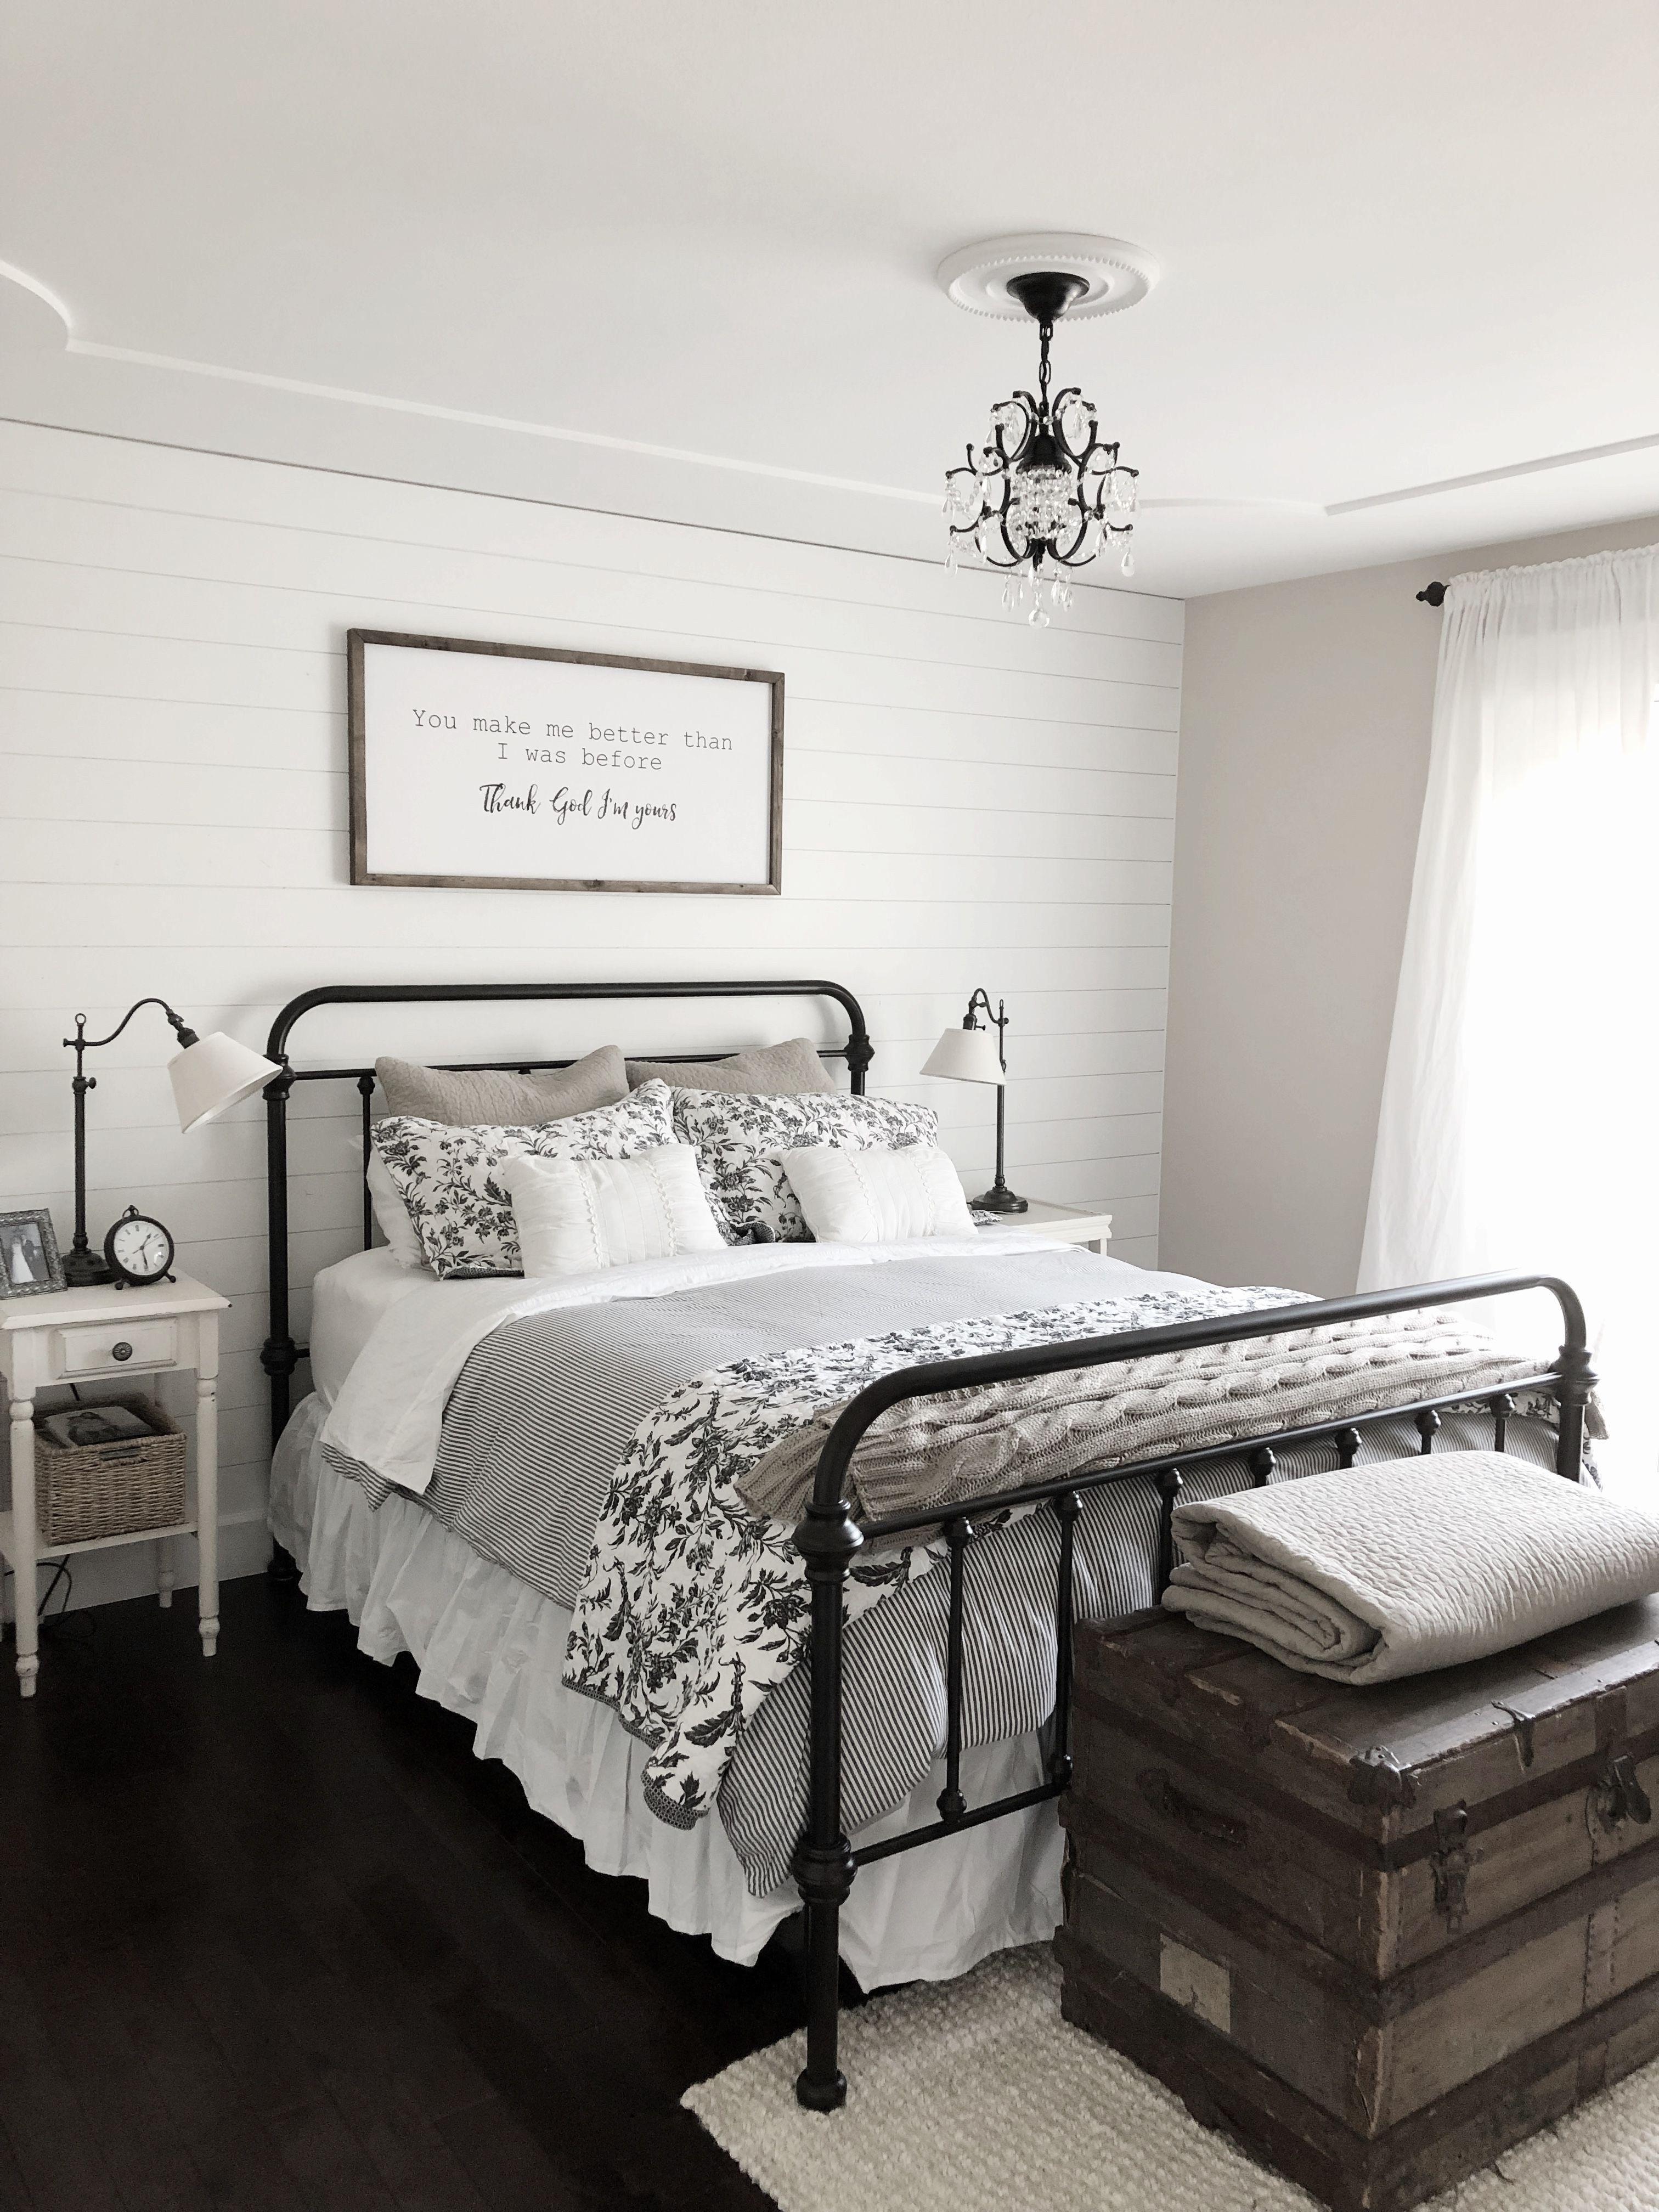 36 gorgeous farmhouse bedroom decorating ideas for your apartment rh pinterest com